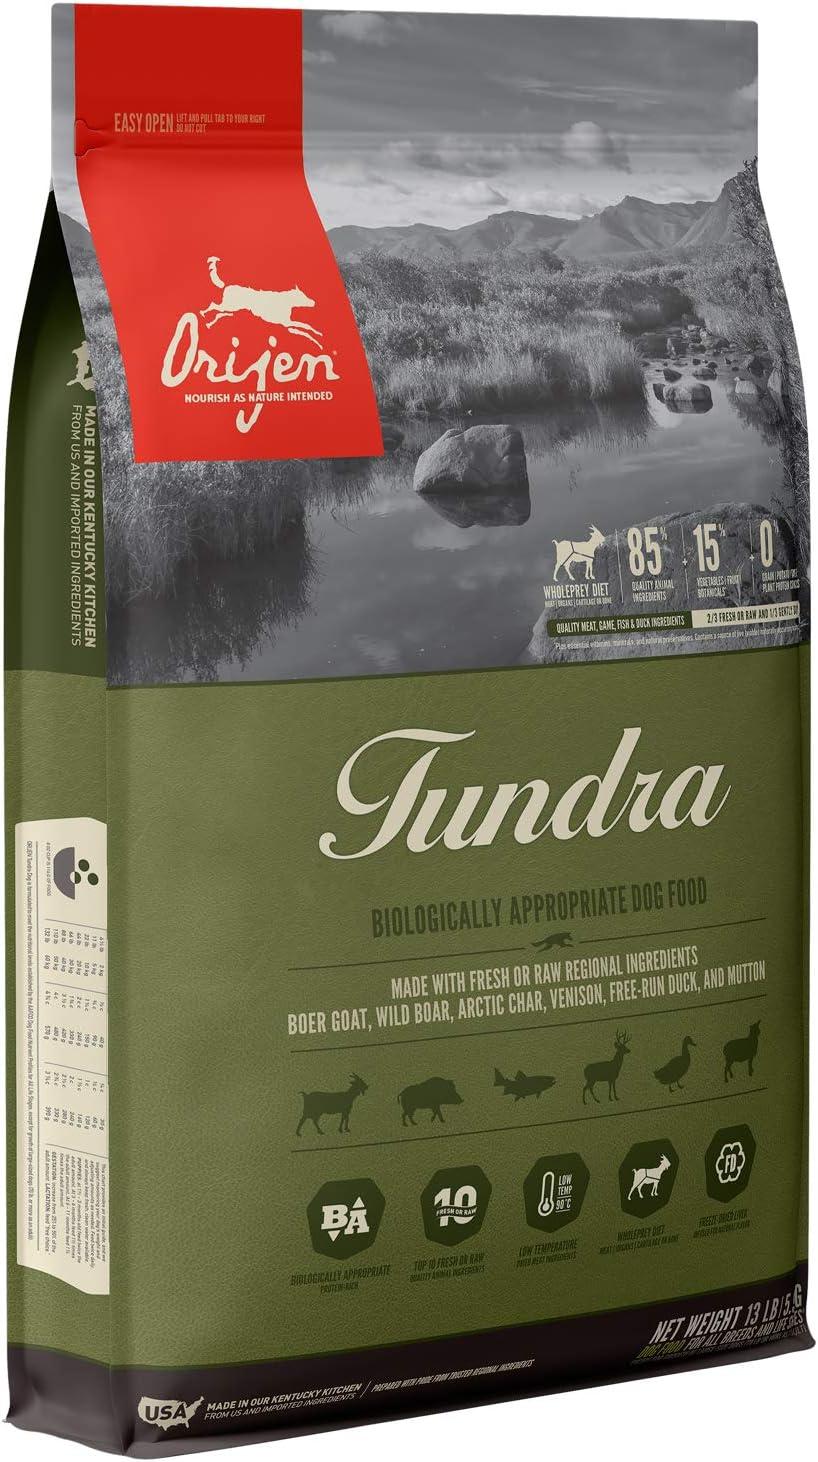 ORIJEN Dry Dog Food, Tundra, Biologically Appropriate & Grain Free